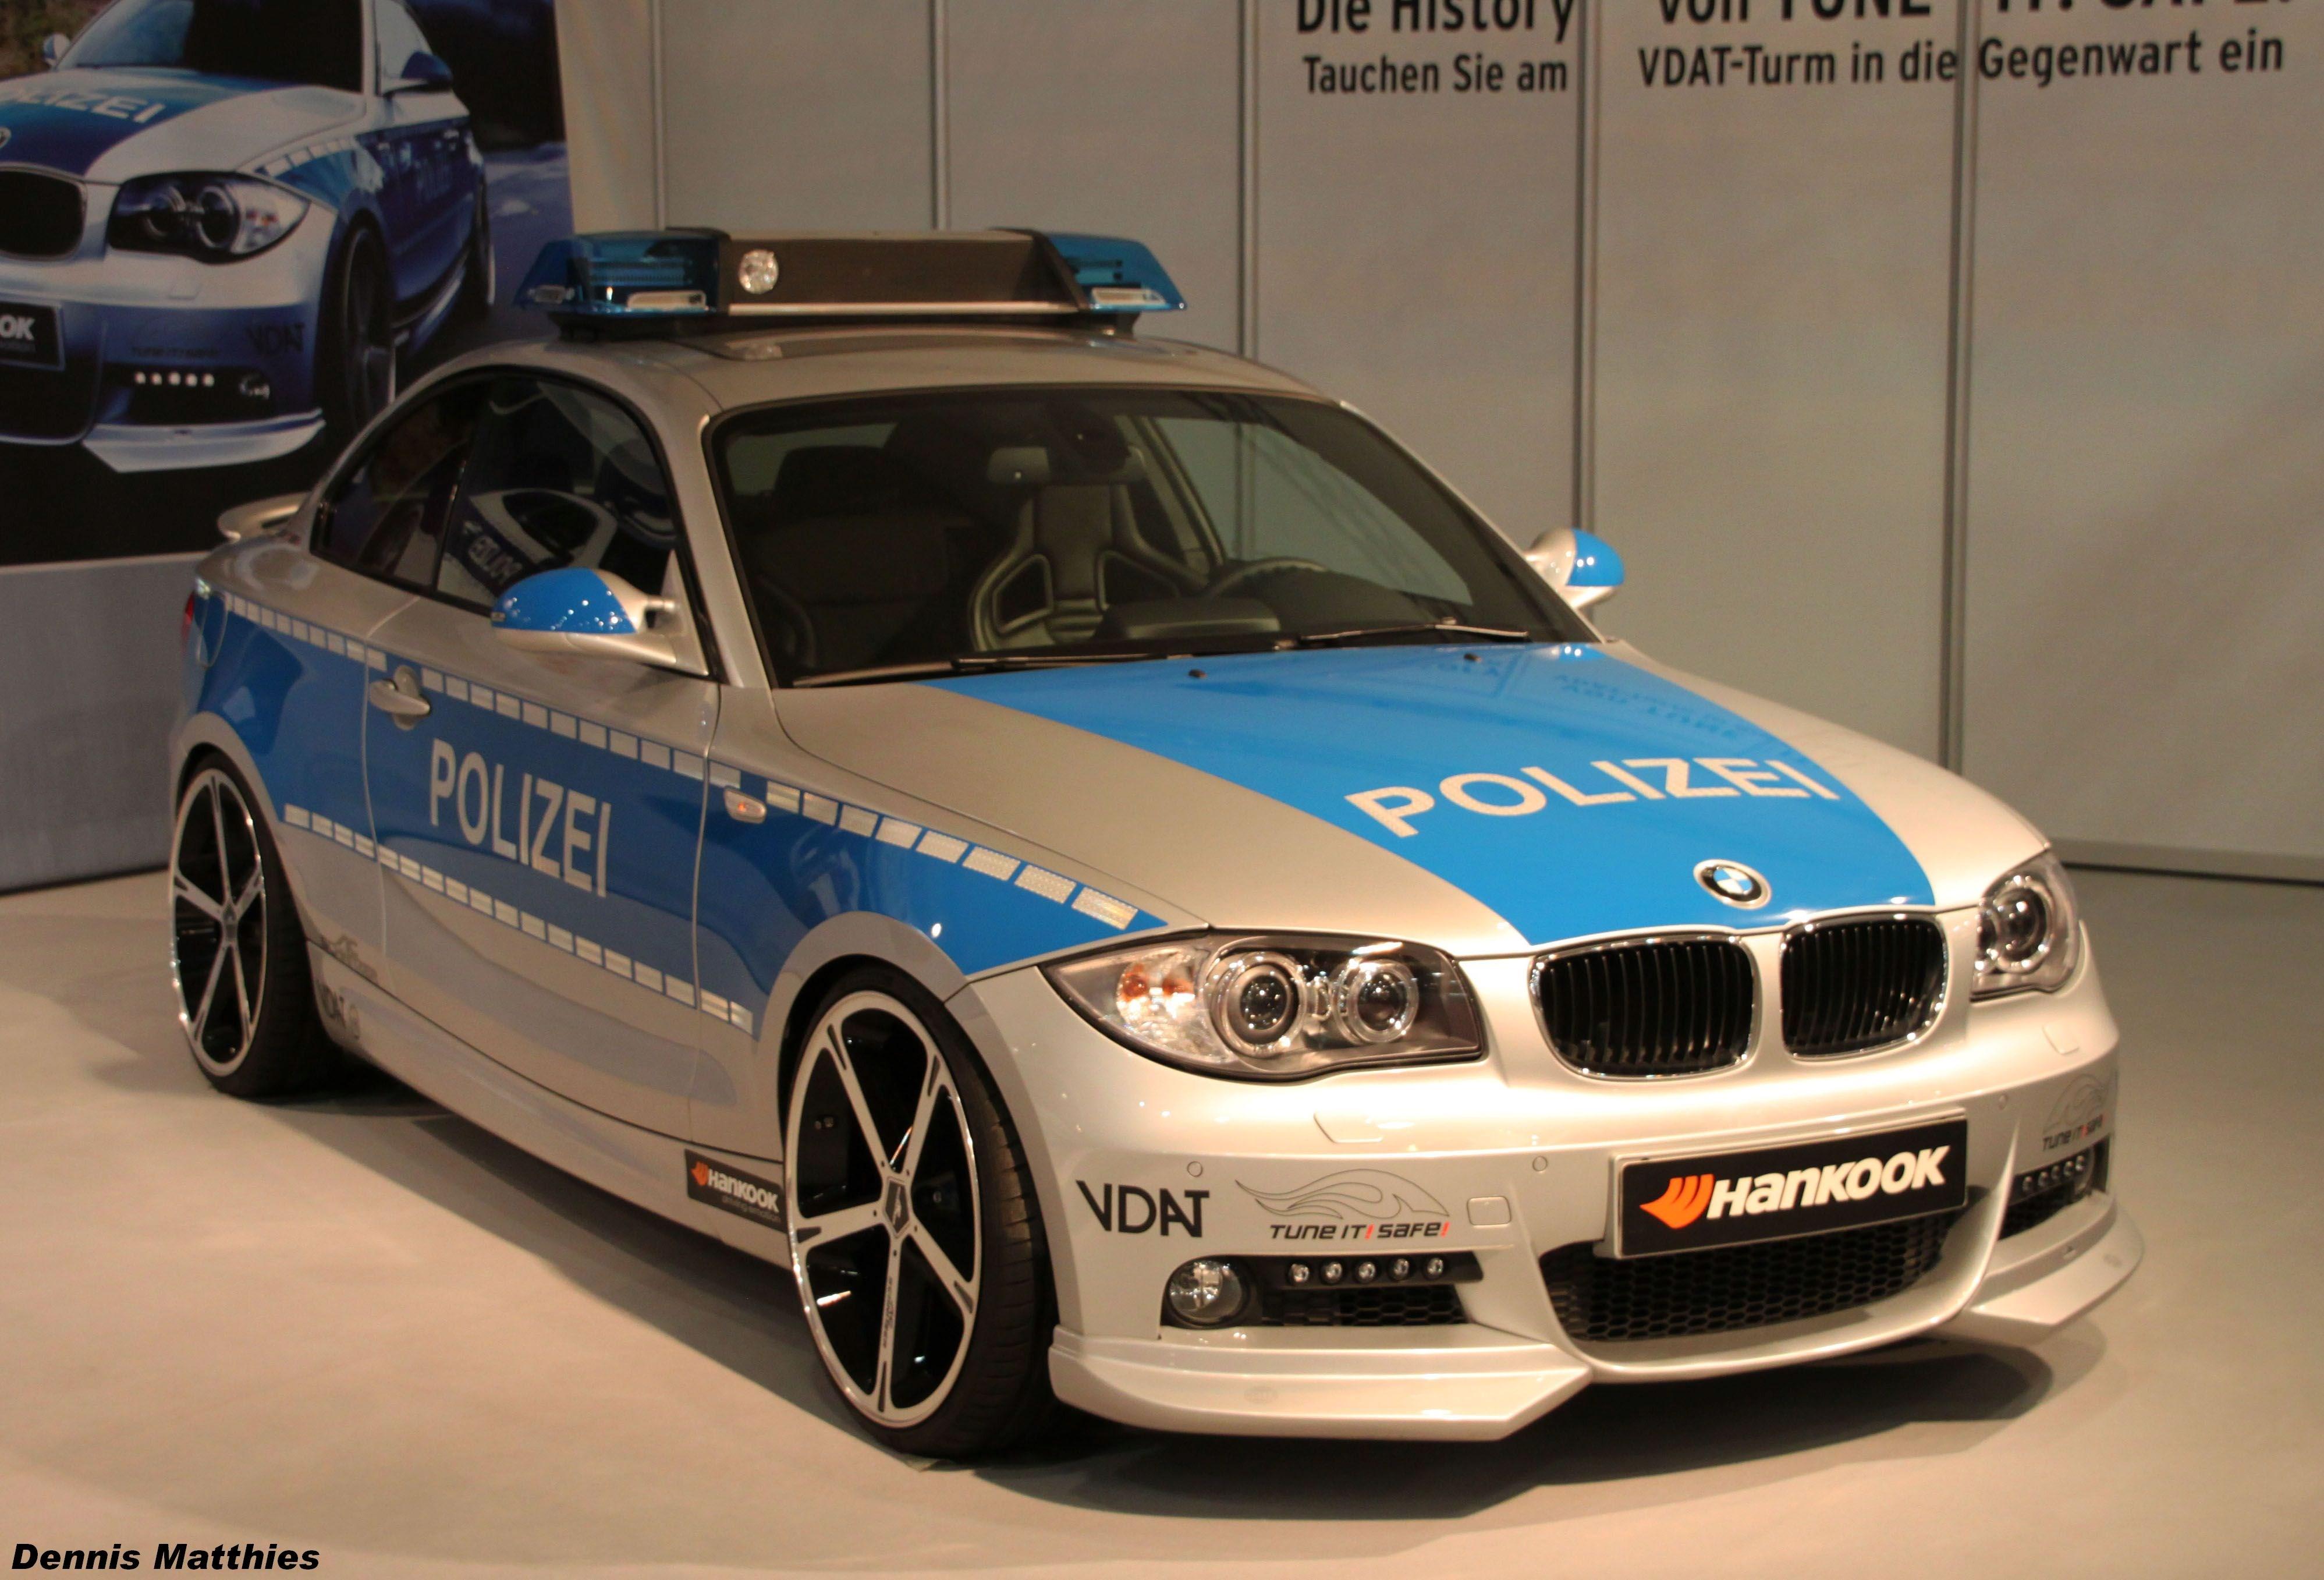 police-1080p-windows-x-wallpaper-wpc9008595